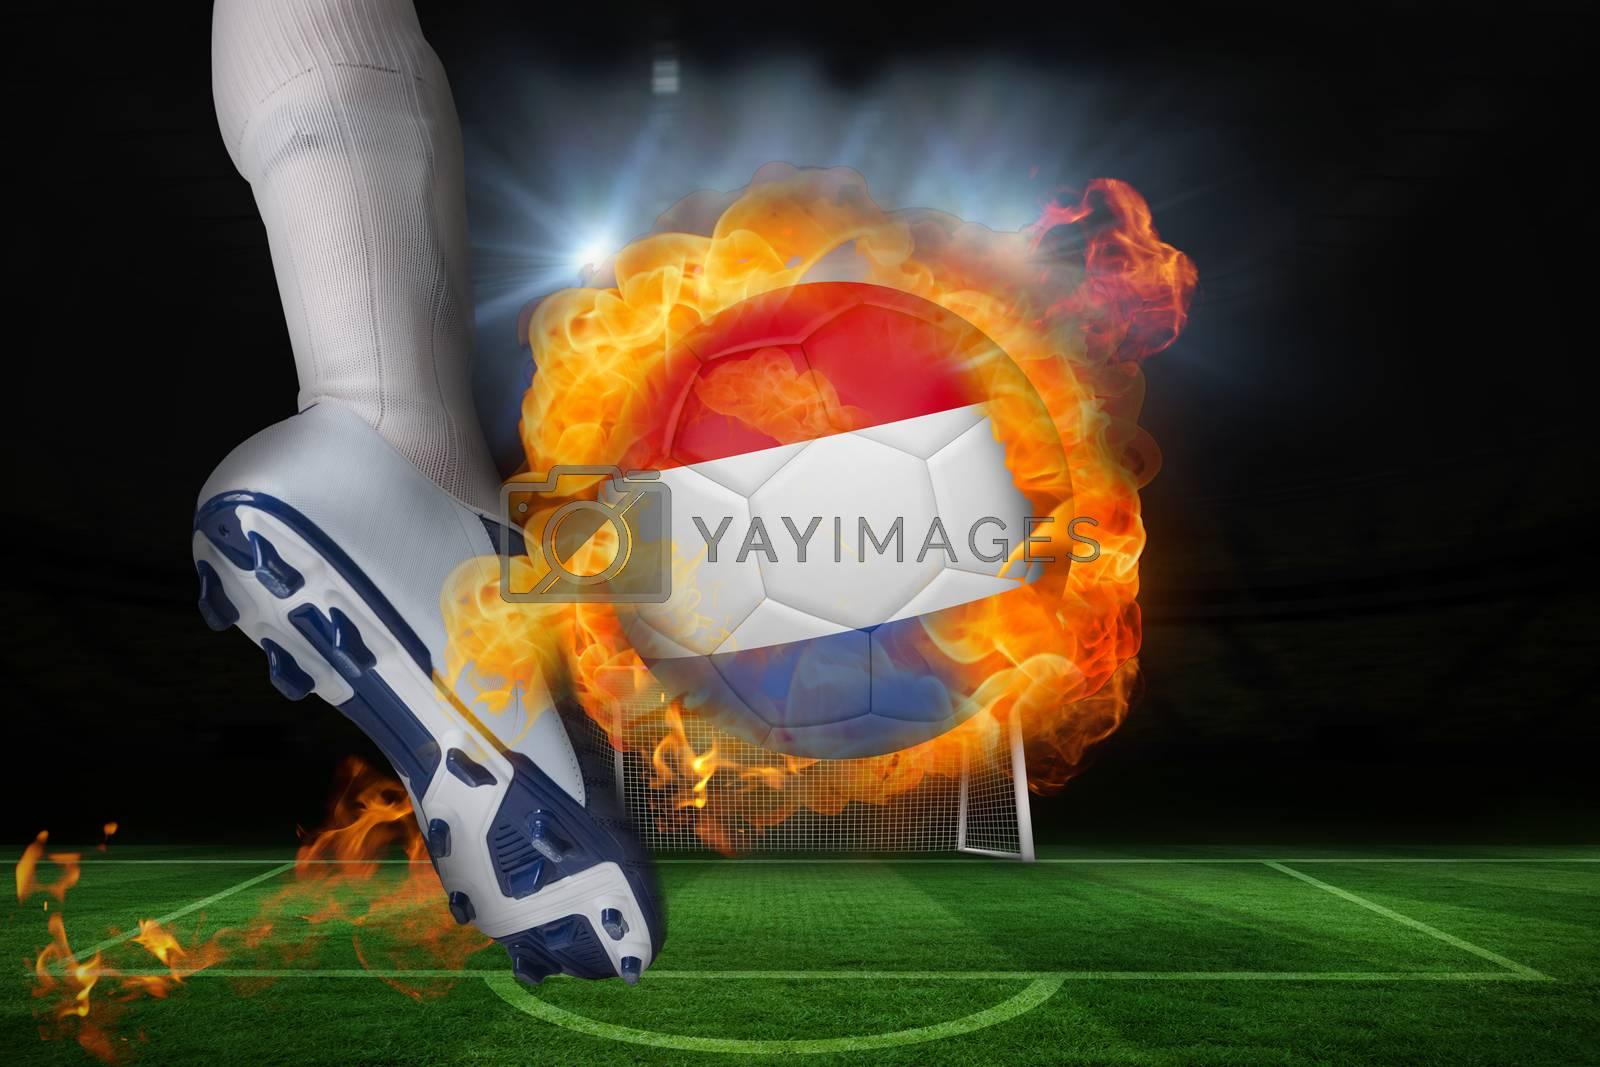 Football player kicking flaming netherlands flag ball by Wavebreakmedia